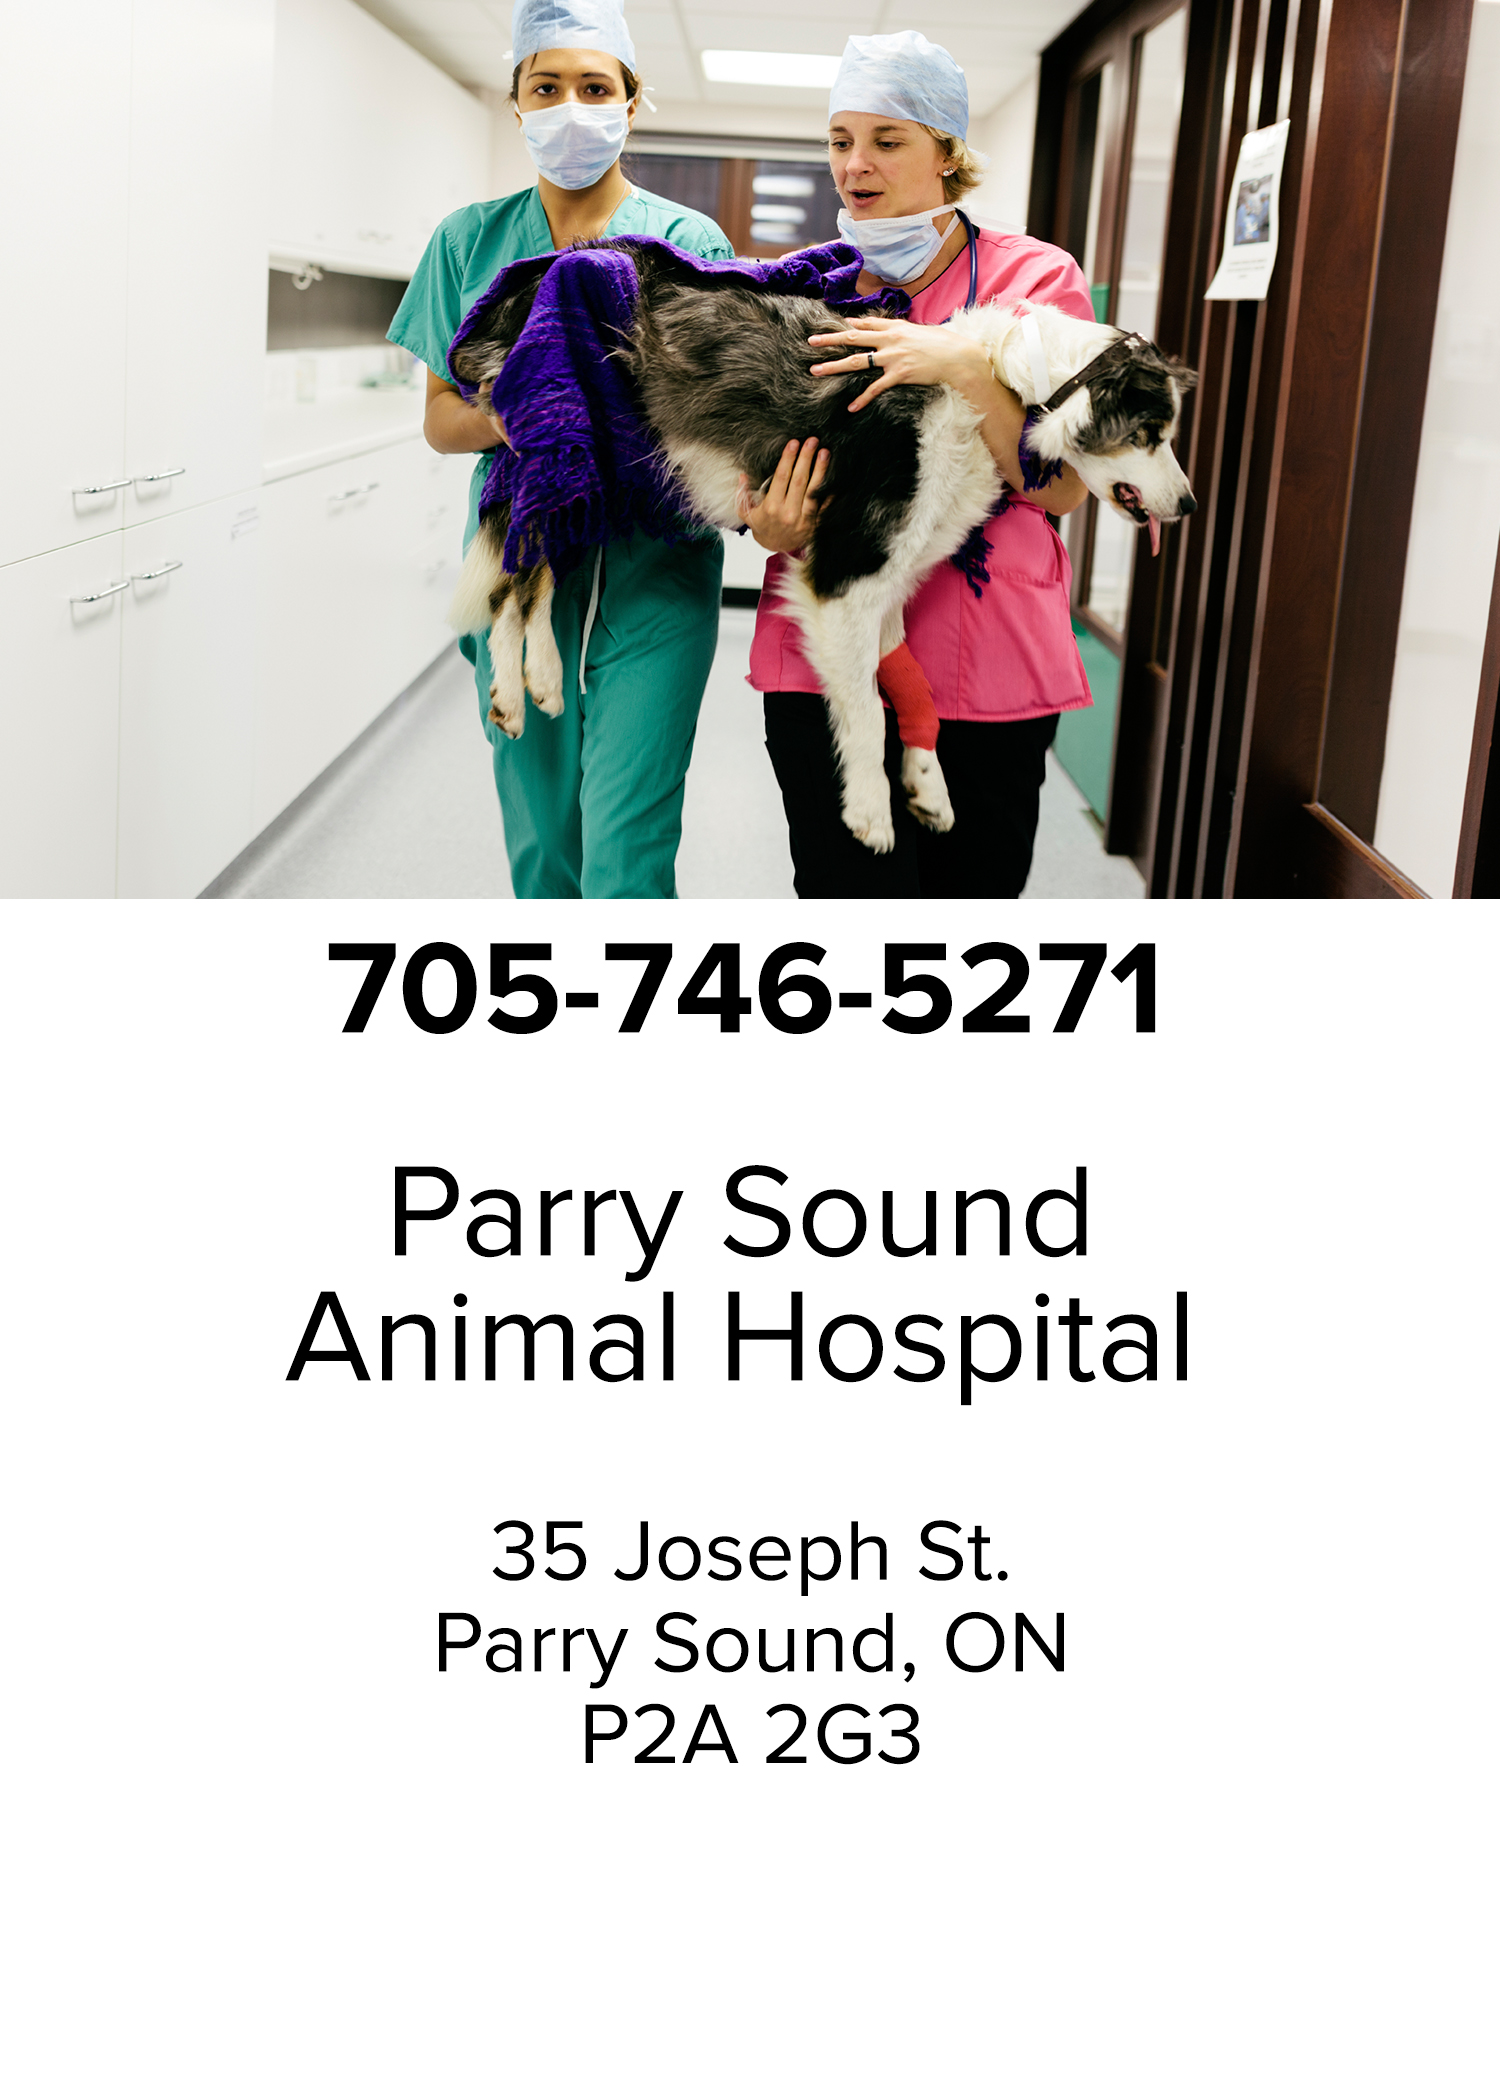 Parry Sound Animal Hospital